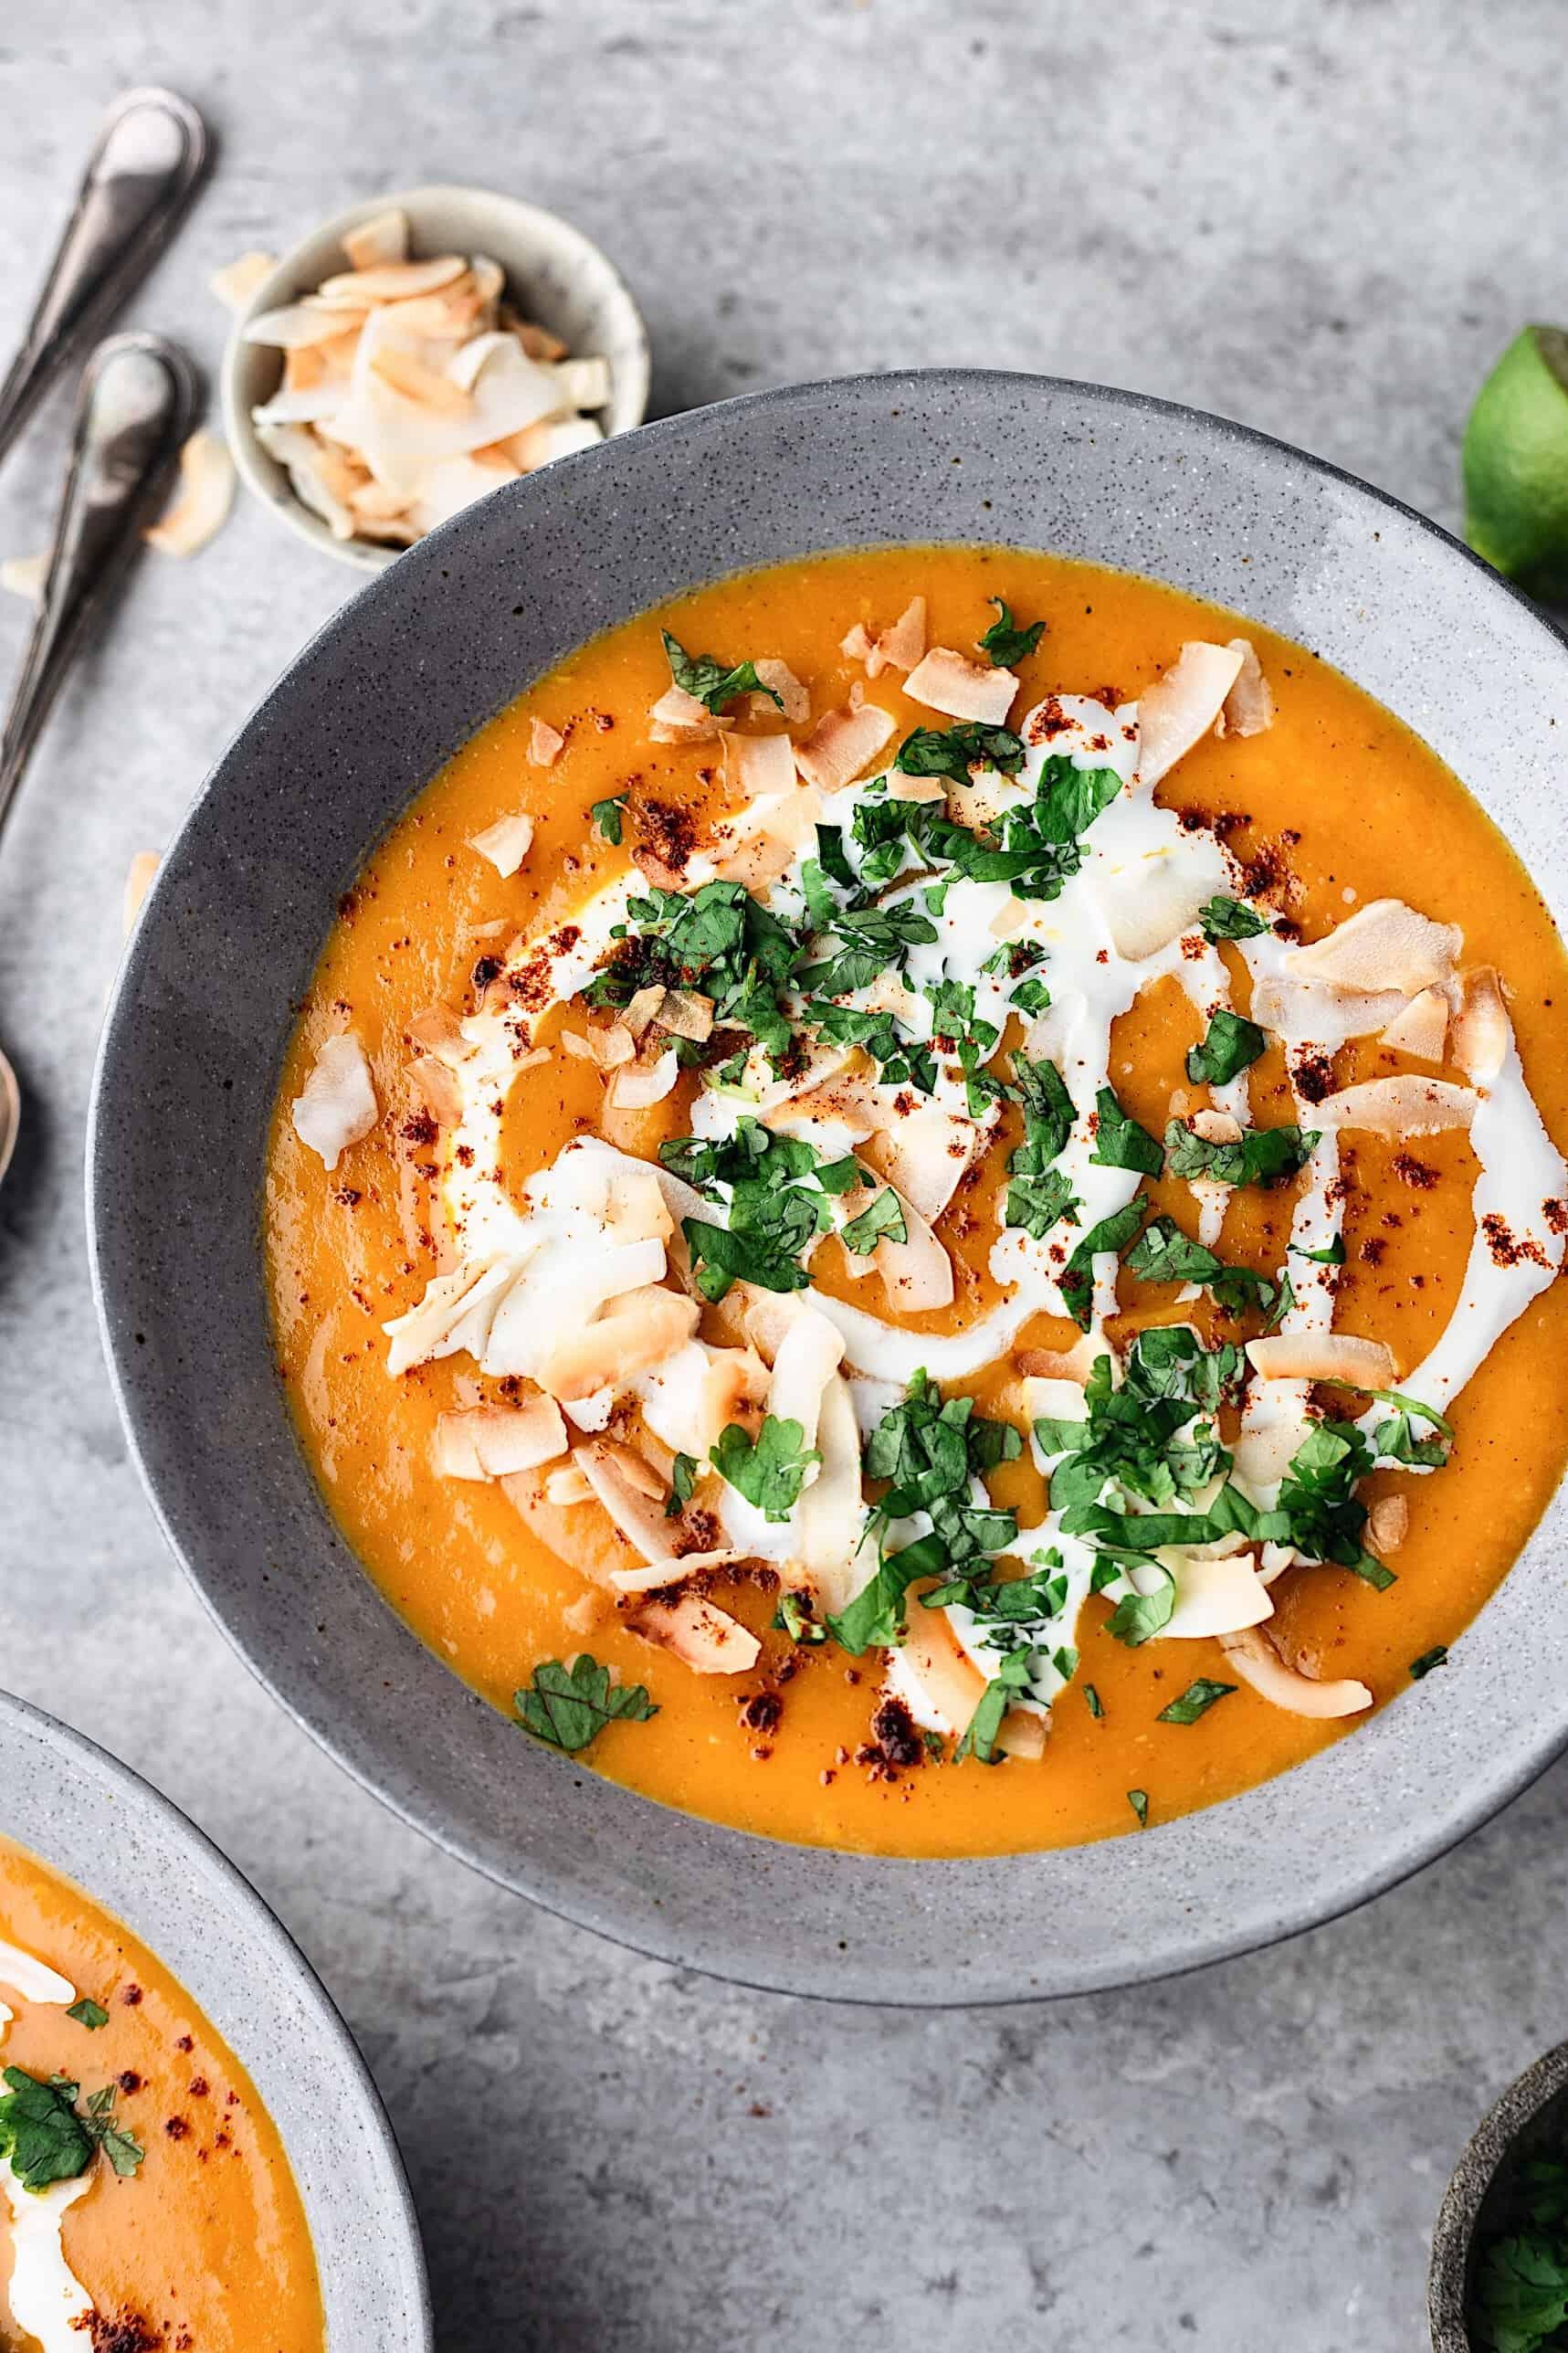 Curried Sweet Potato Coconut Soup #soup #vegan #recipe #sweetpotato #fall #autumn #coconut #curry #spice